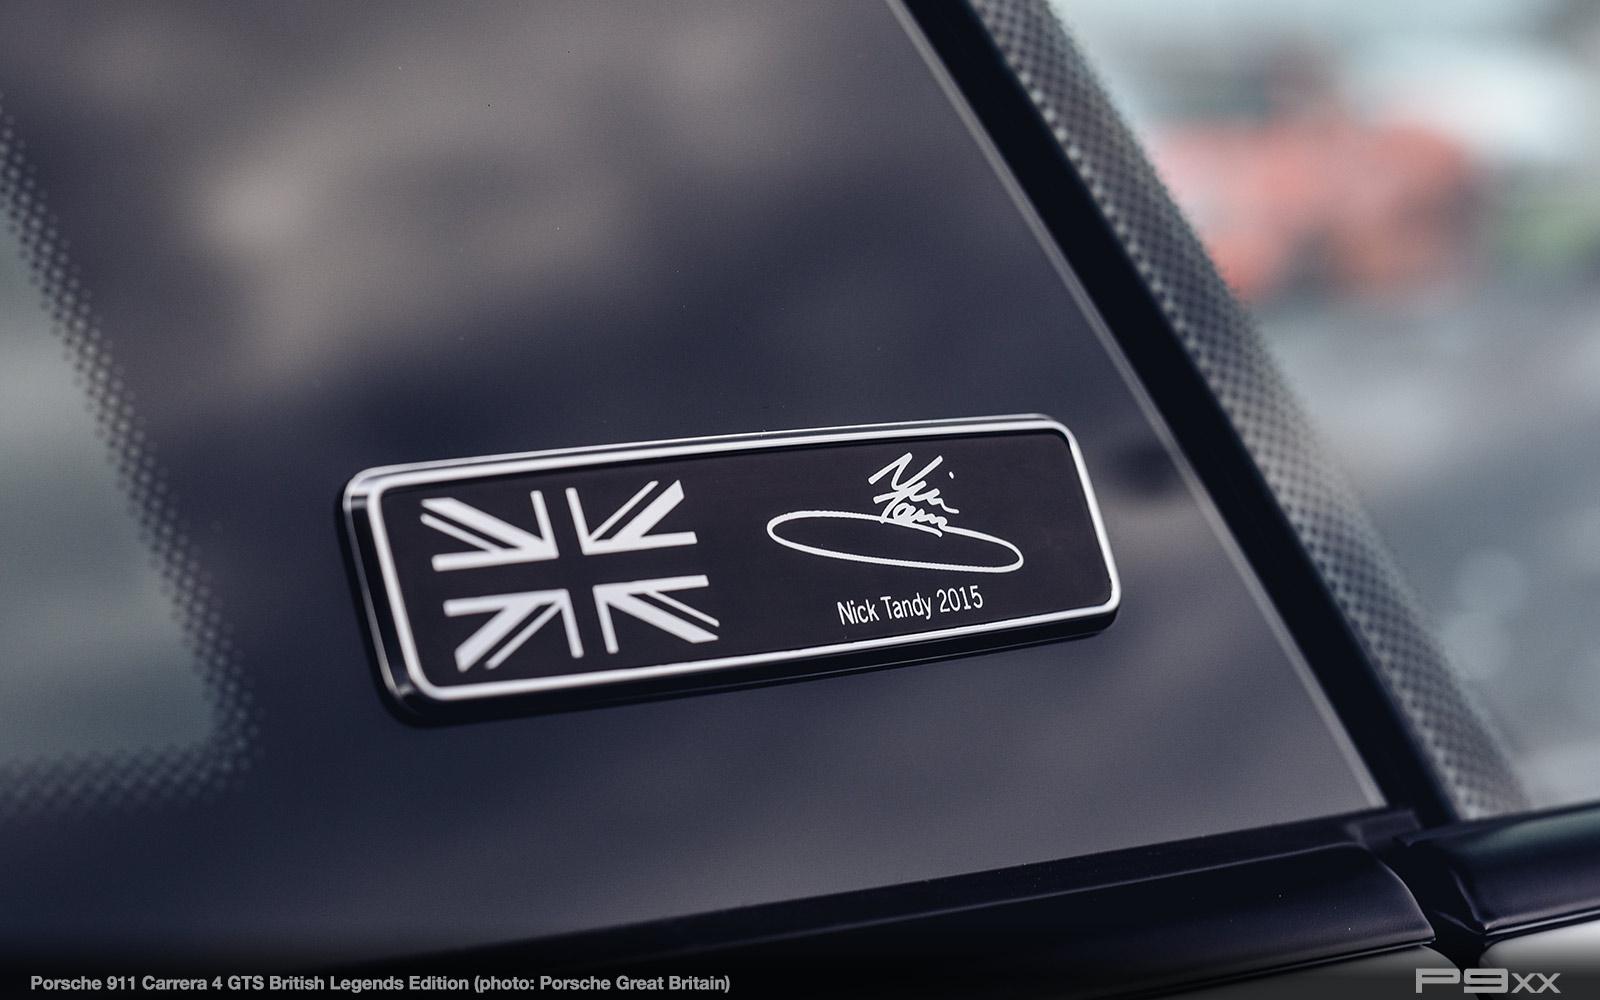 Porsche-911-Carrera-4-GTS-British-Legends-Edition-373